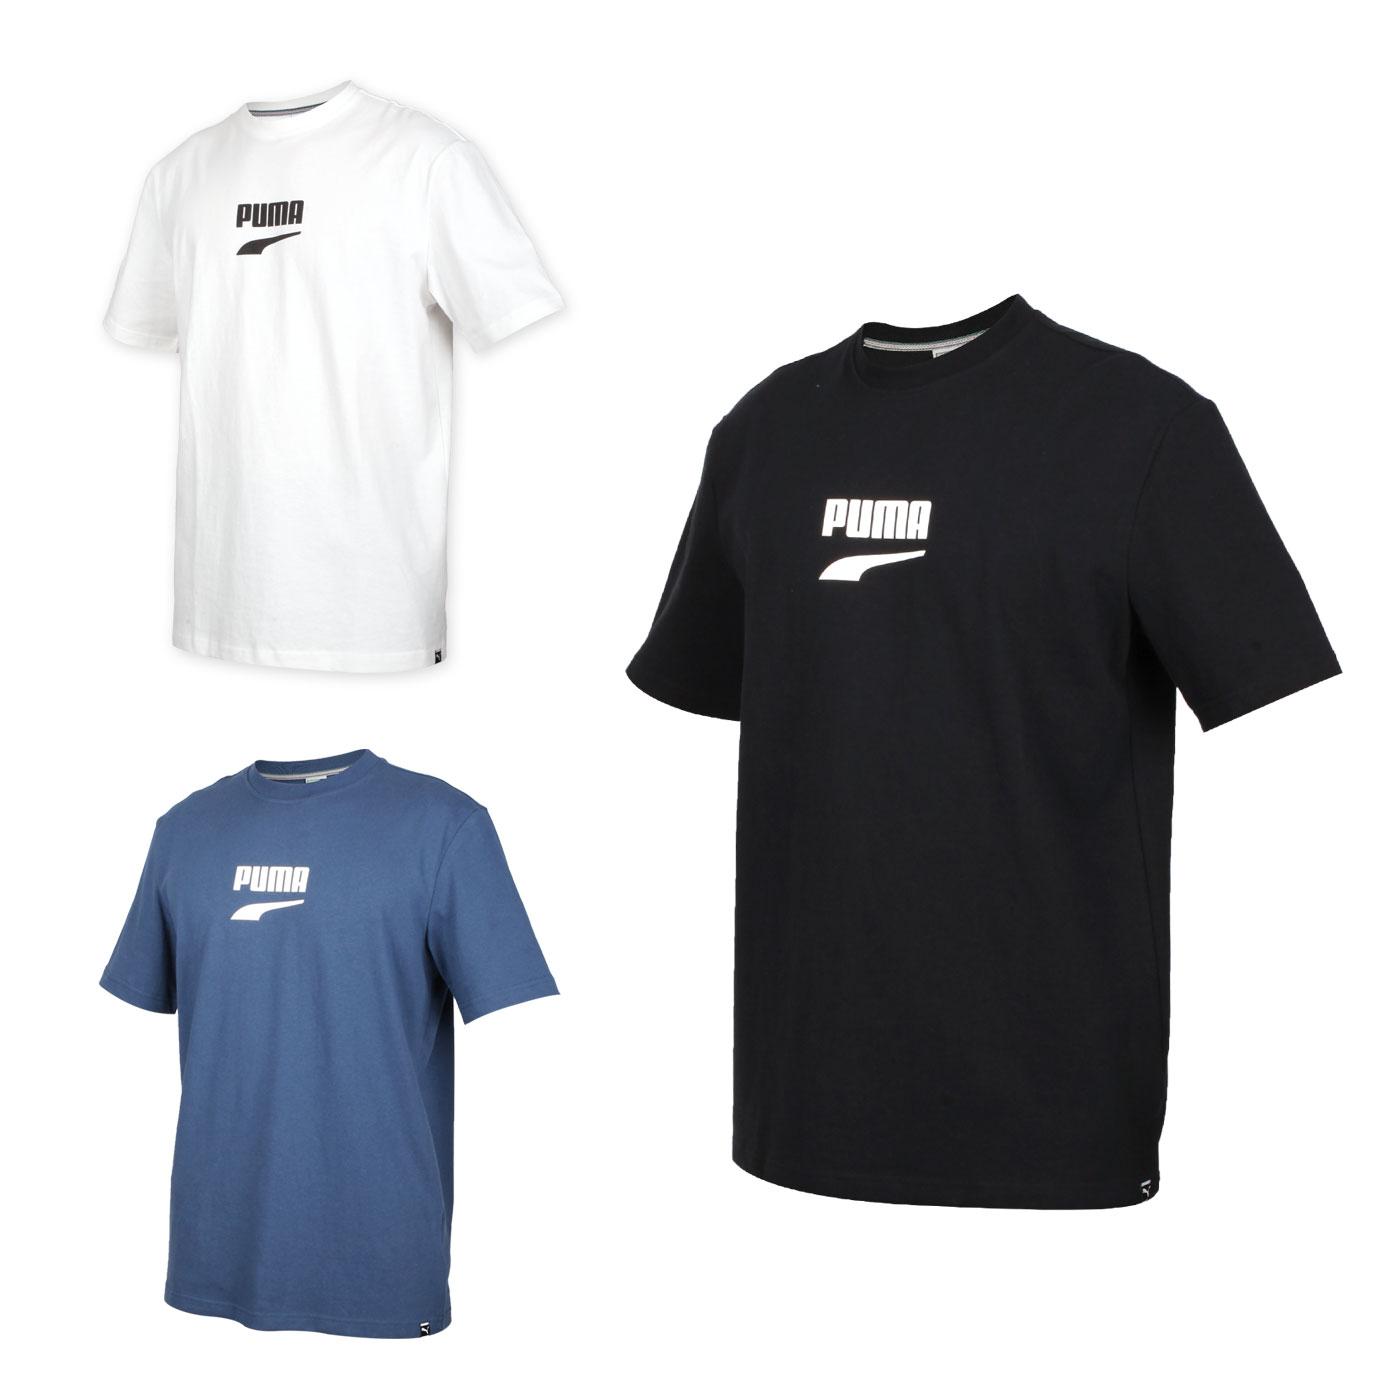 PUMA 男款流行系列短袖T恤 59636701